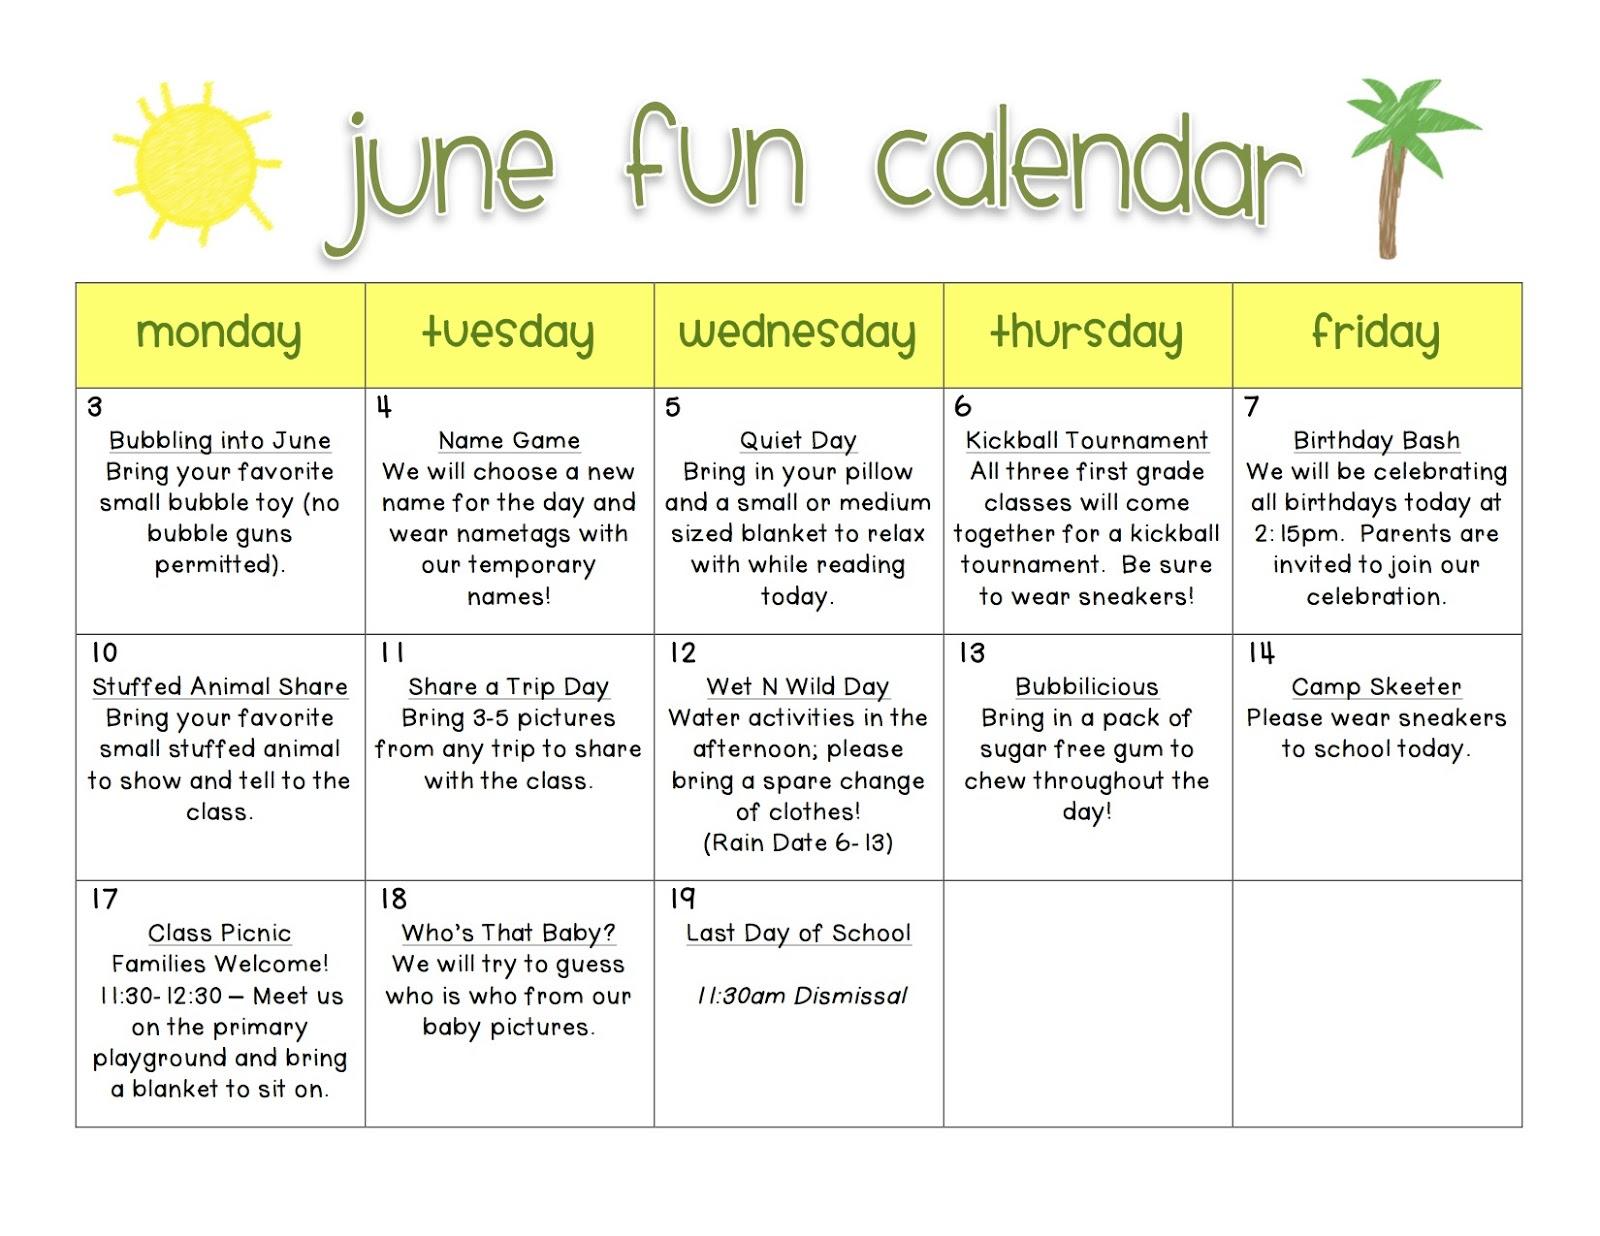 June Fun Calendar